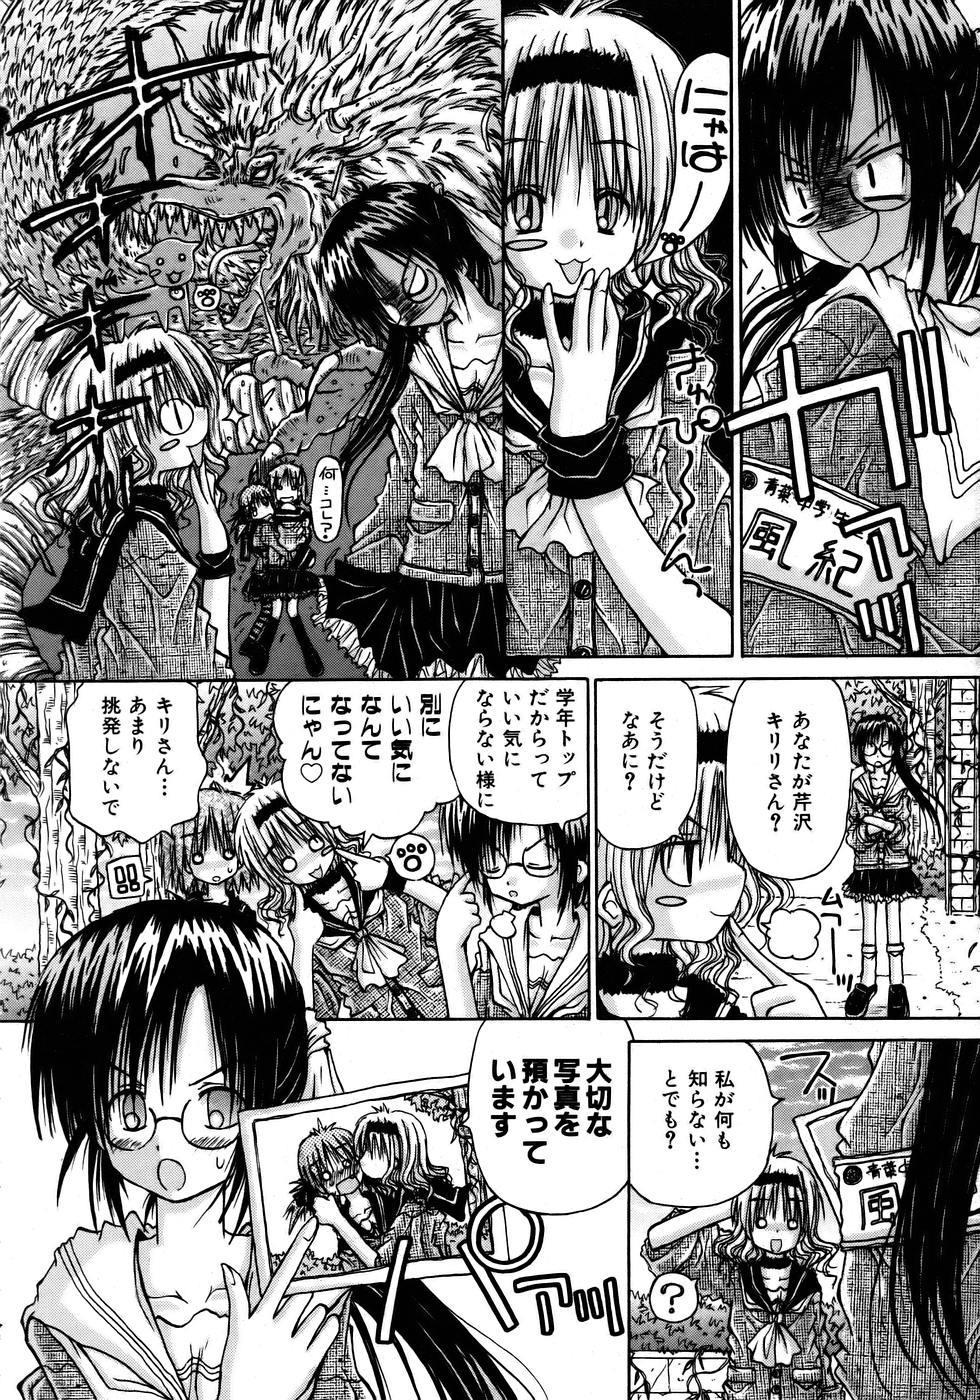 COMIC AUN 2005-12 Vol. 115 369